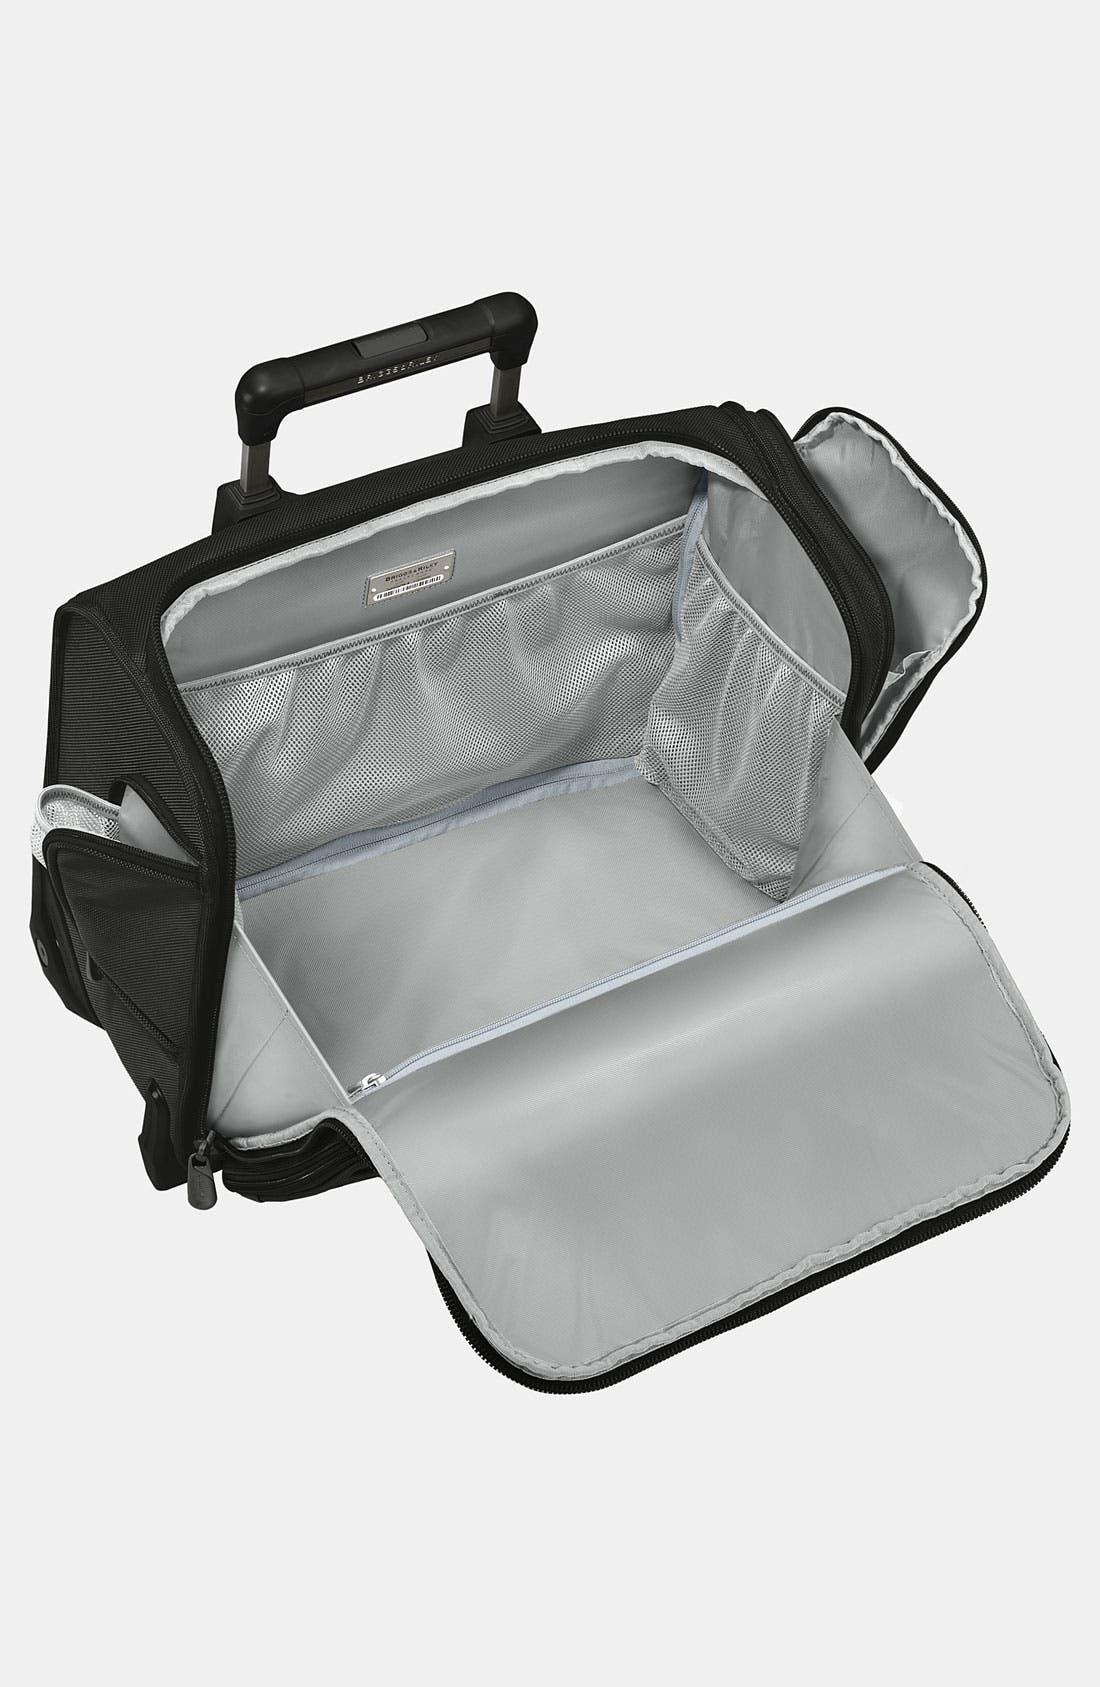 Alternate Image 3  - Briggs & Riley 'Baseline' Rolling Cabin Bag (16 Inch)